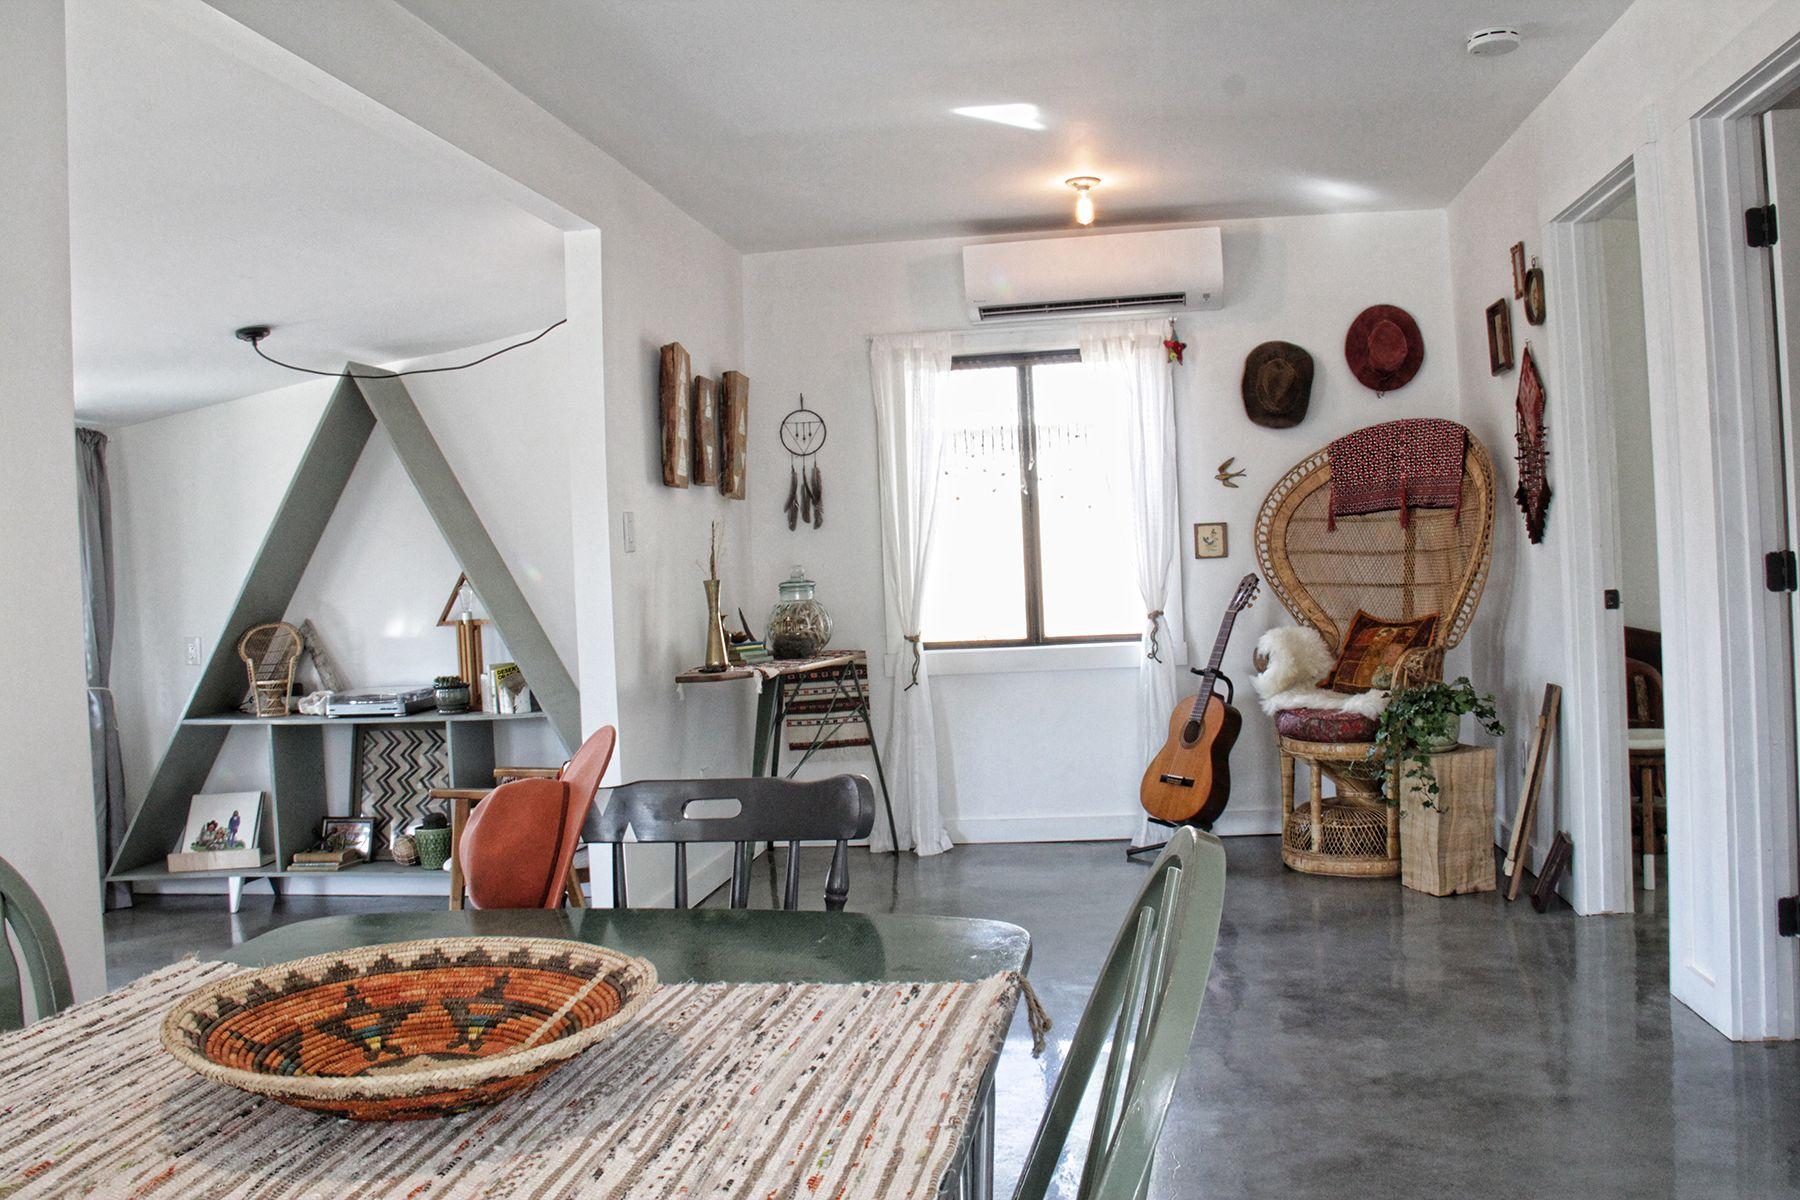 Stoere Bohemien Bungalow : Modern bohemian interior @theluxeboheme bohemian interiors